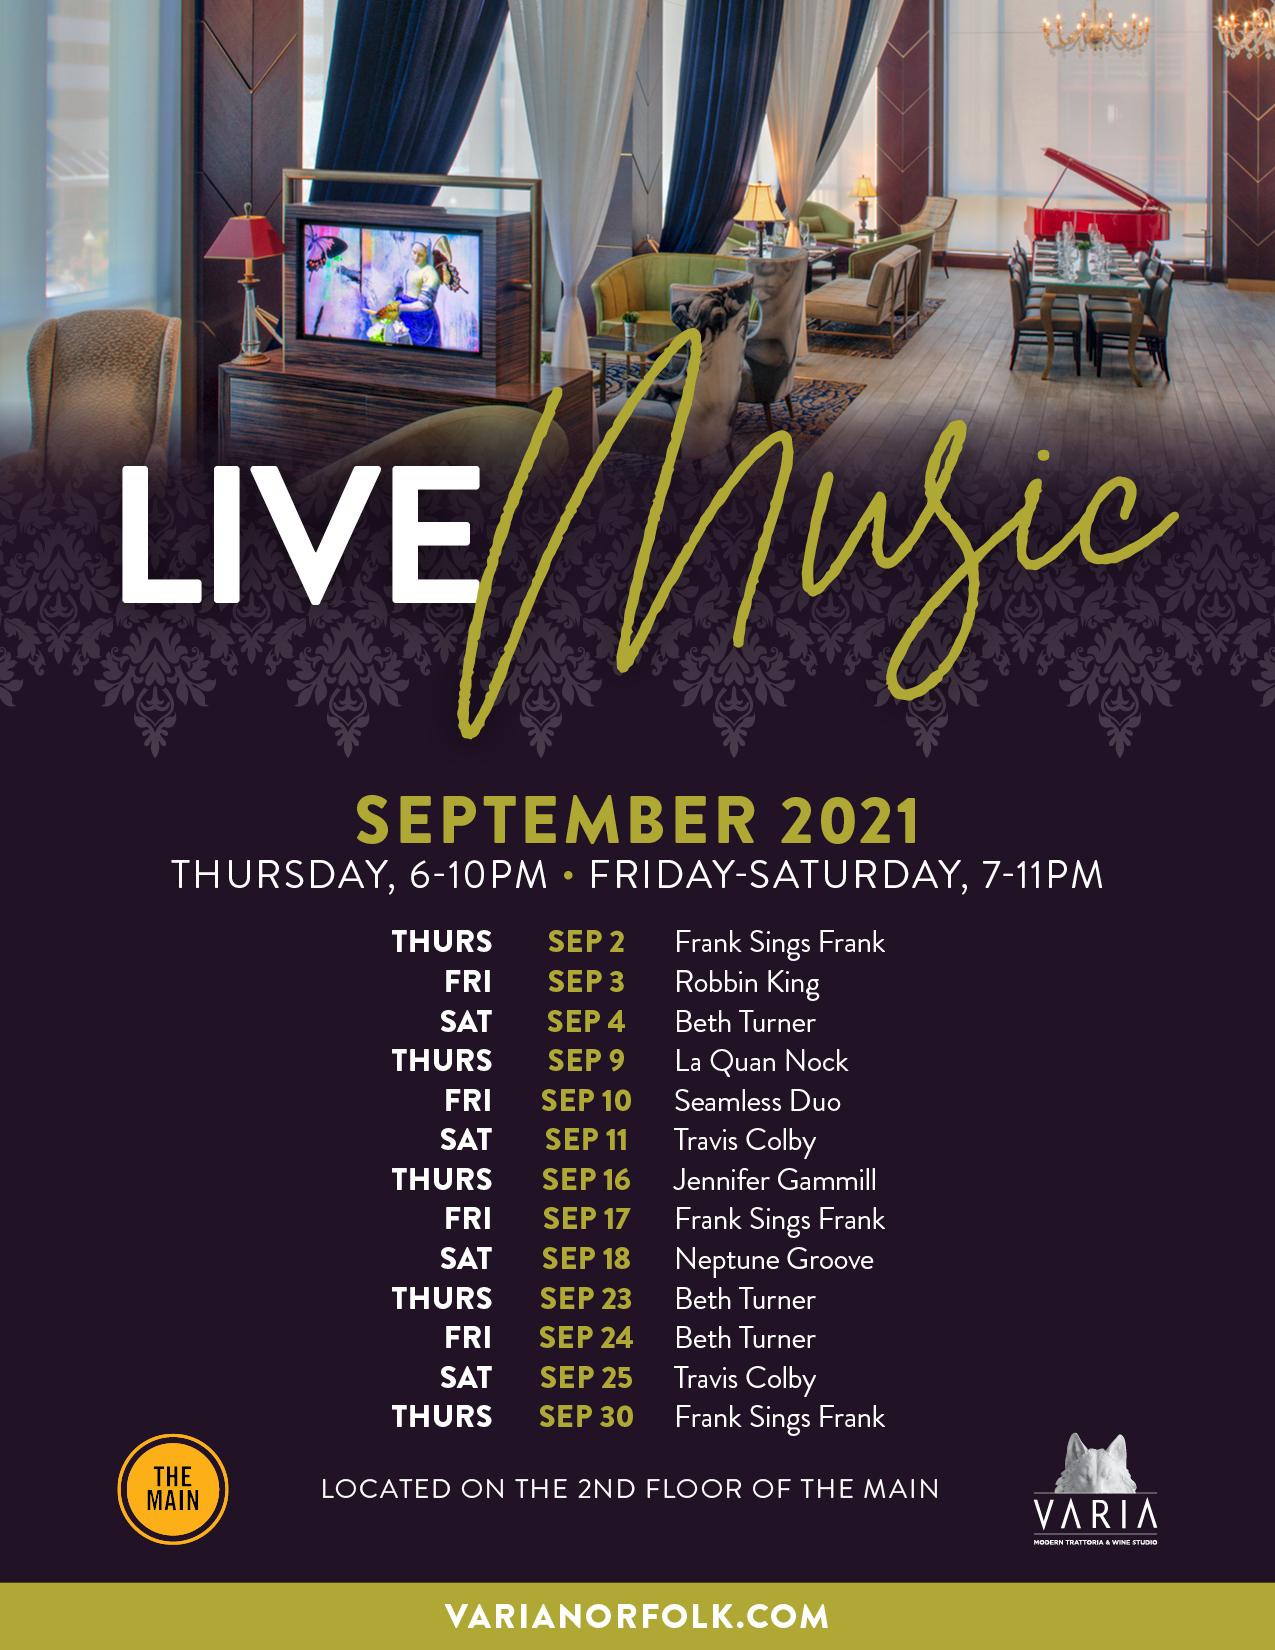 VARIA_0344_EntertainmentCal_Sept21_Flyer